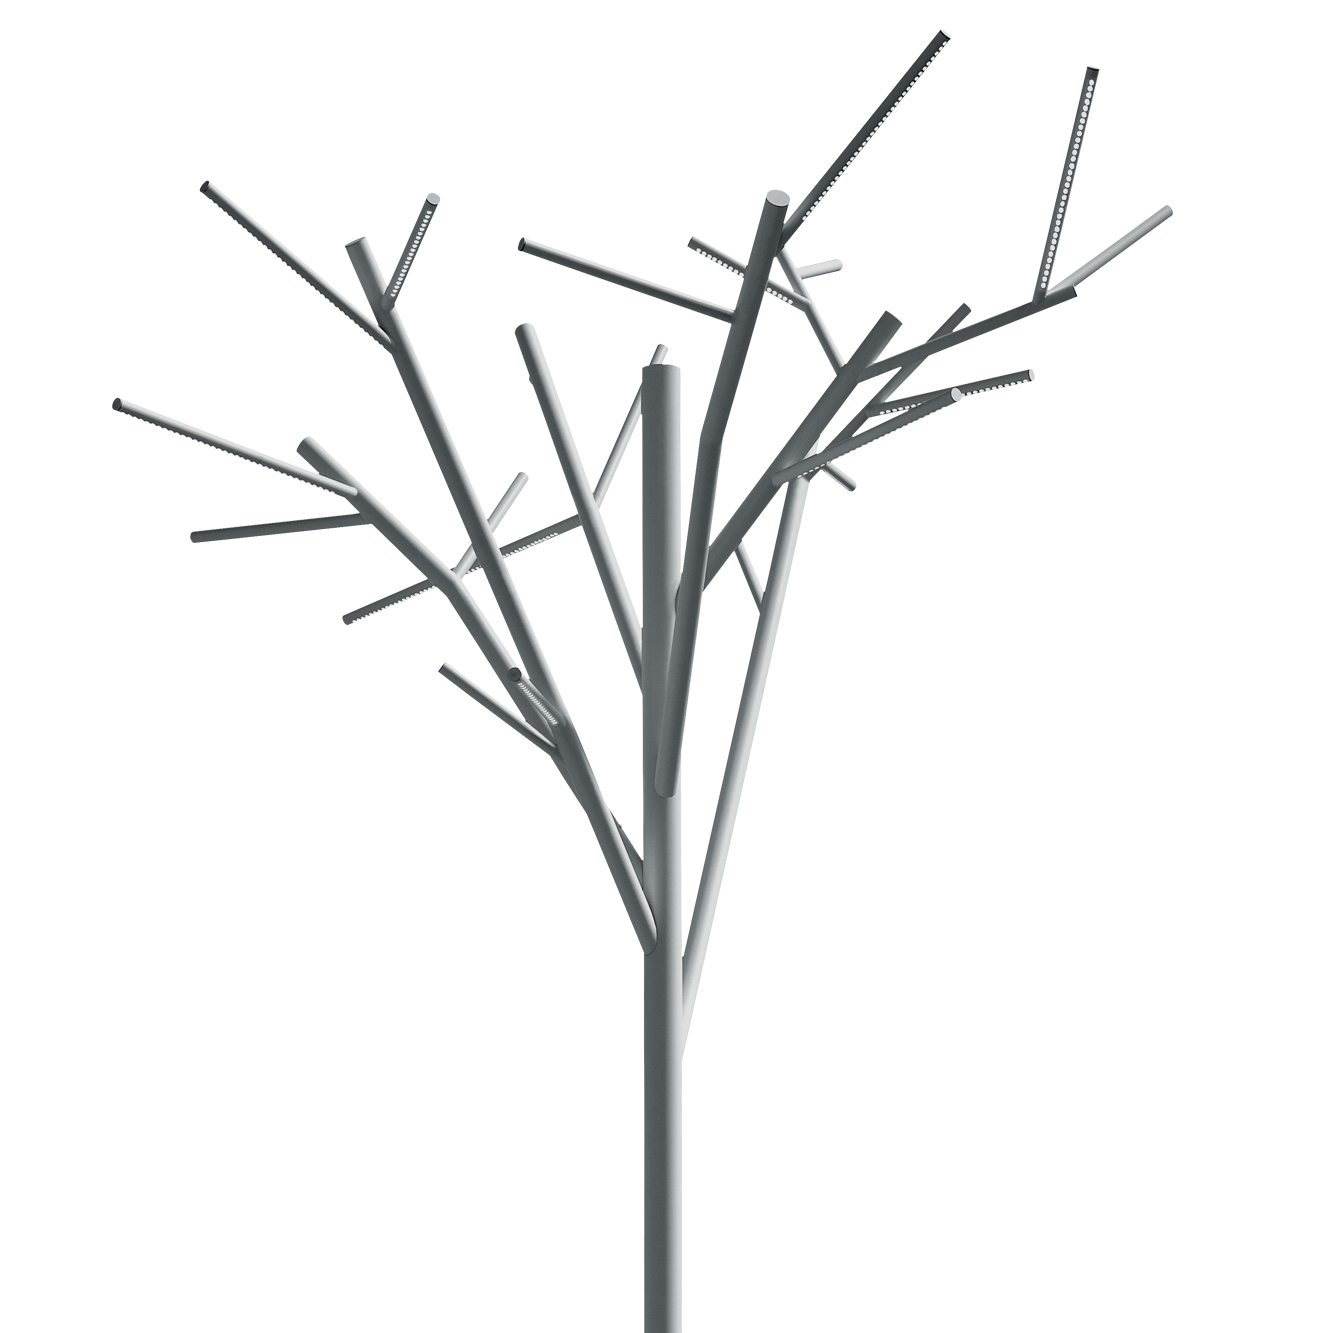 Albero Pole System